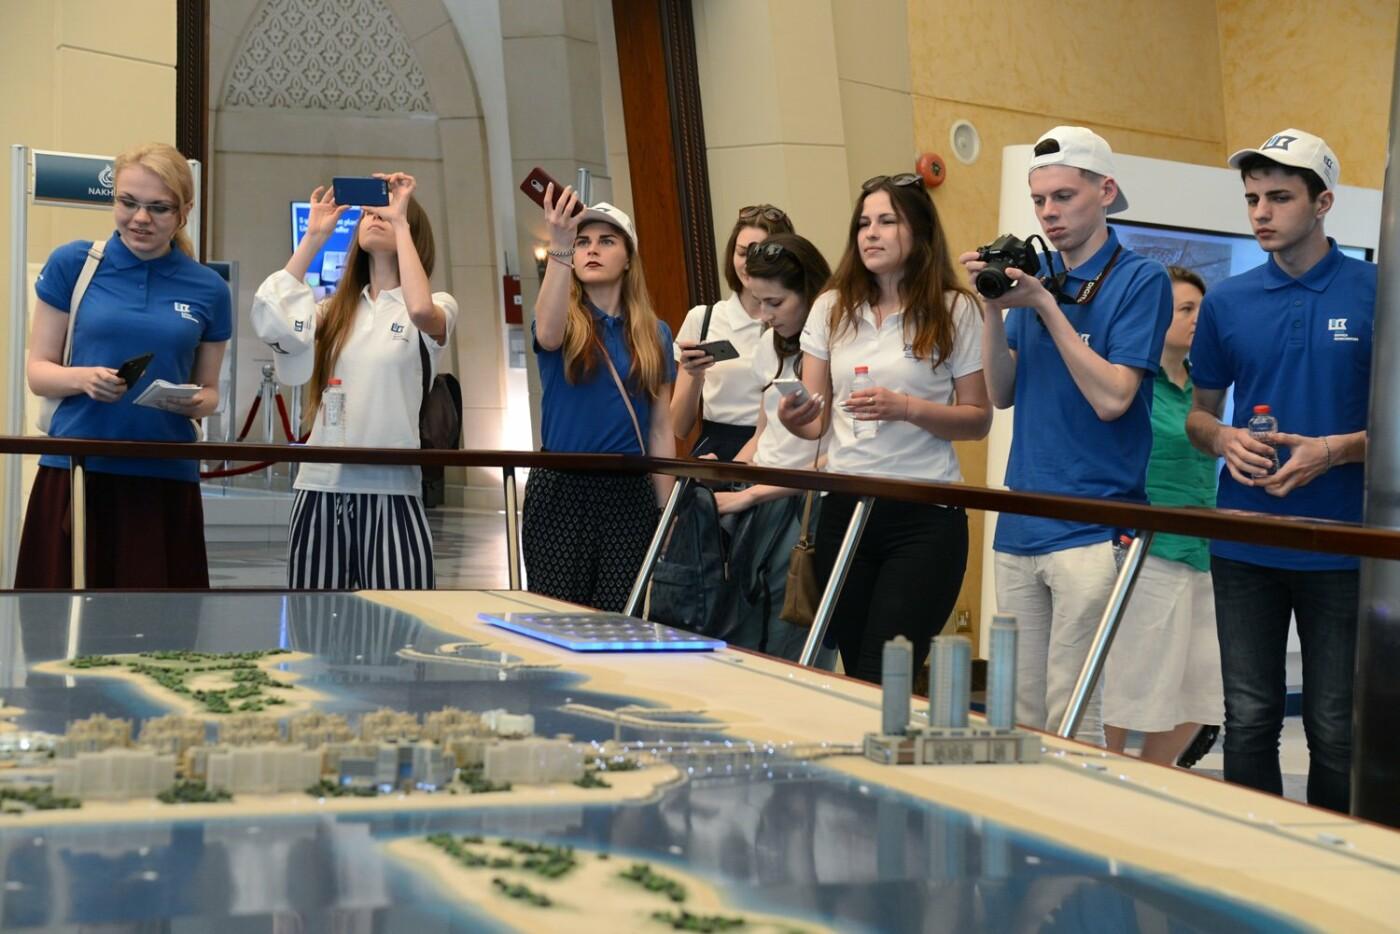 Борис Колесников показал студентам-архитекторам из Краматорска Дубай, фото-3